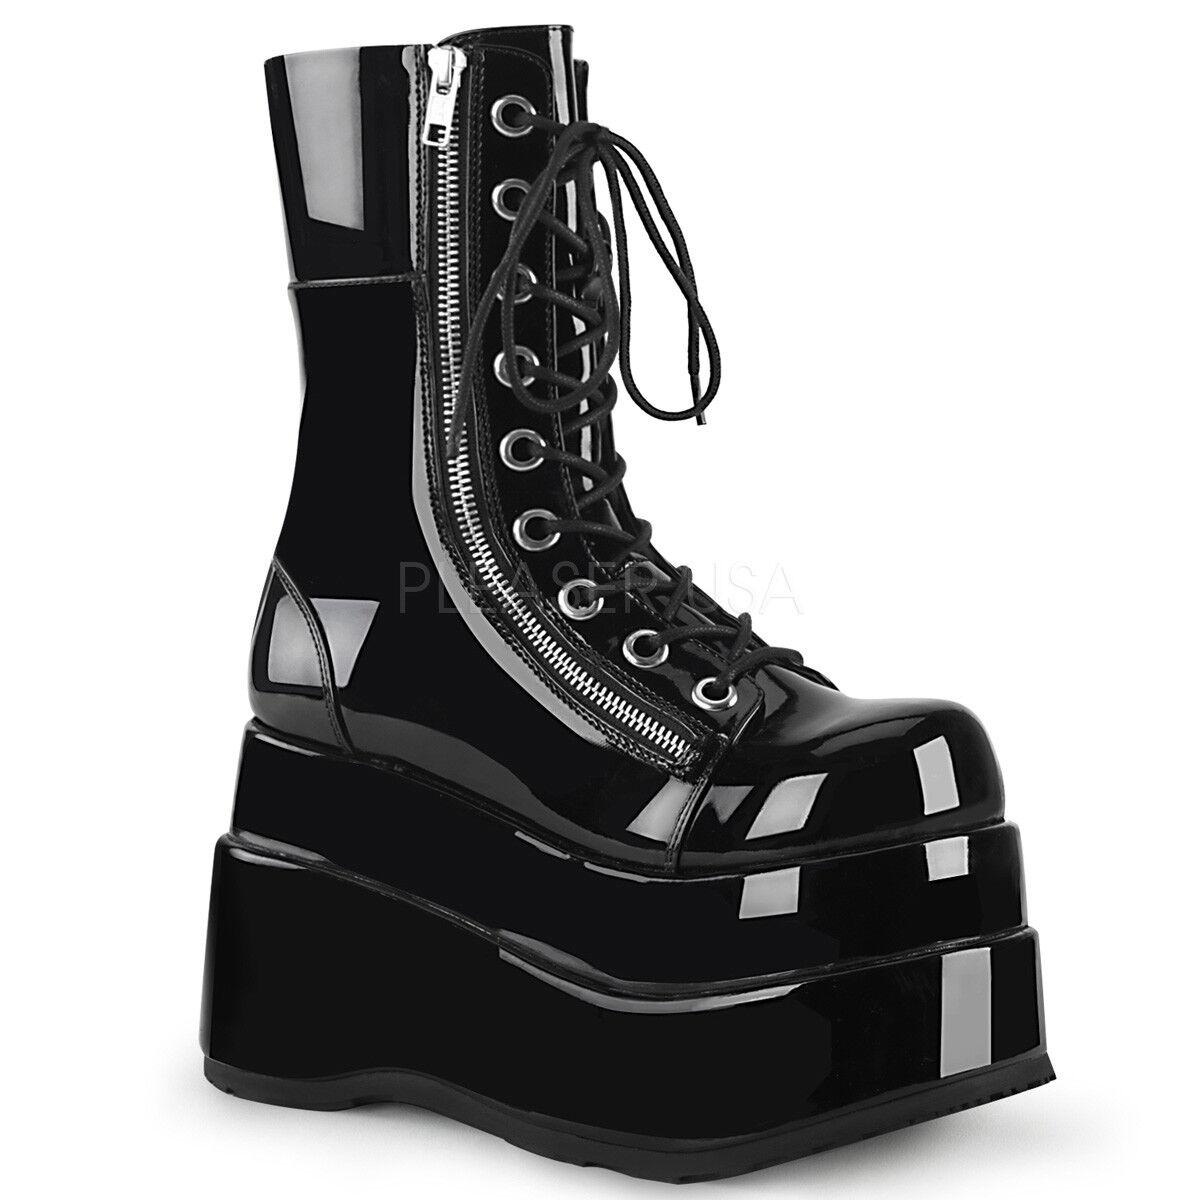 Huge Demonia 4.5  Stacked Platform Shiny nero Calf Zipper stivali Goth 6-12